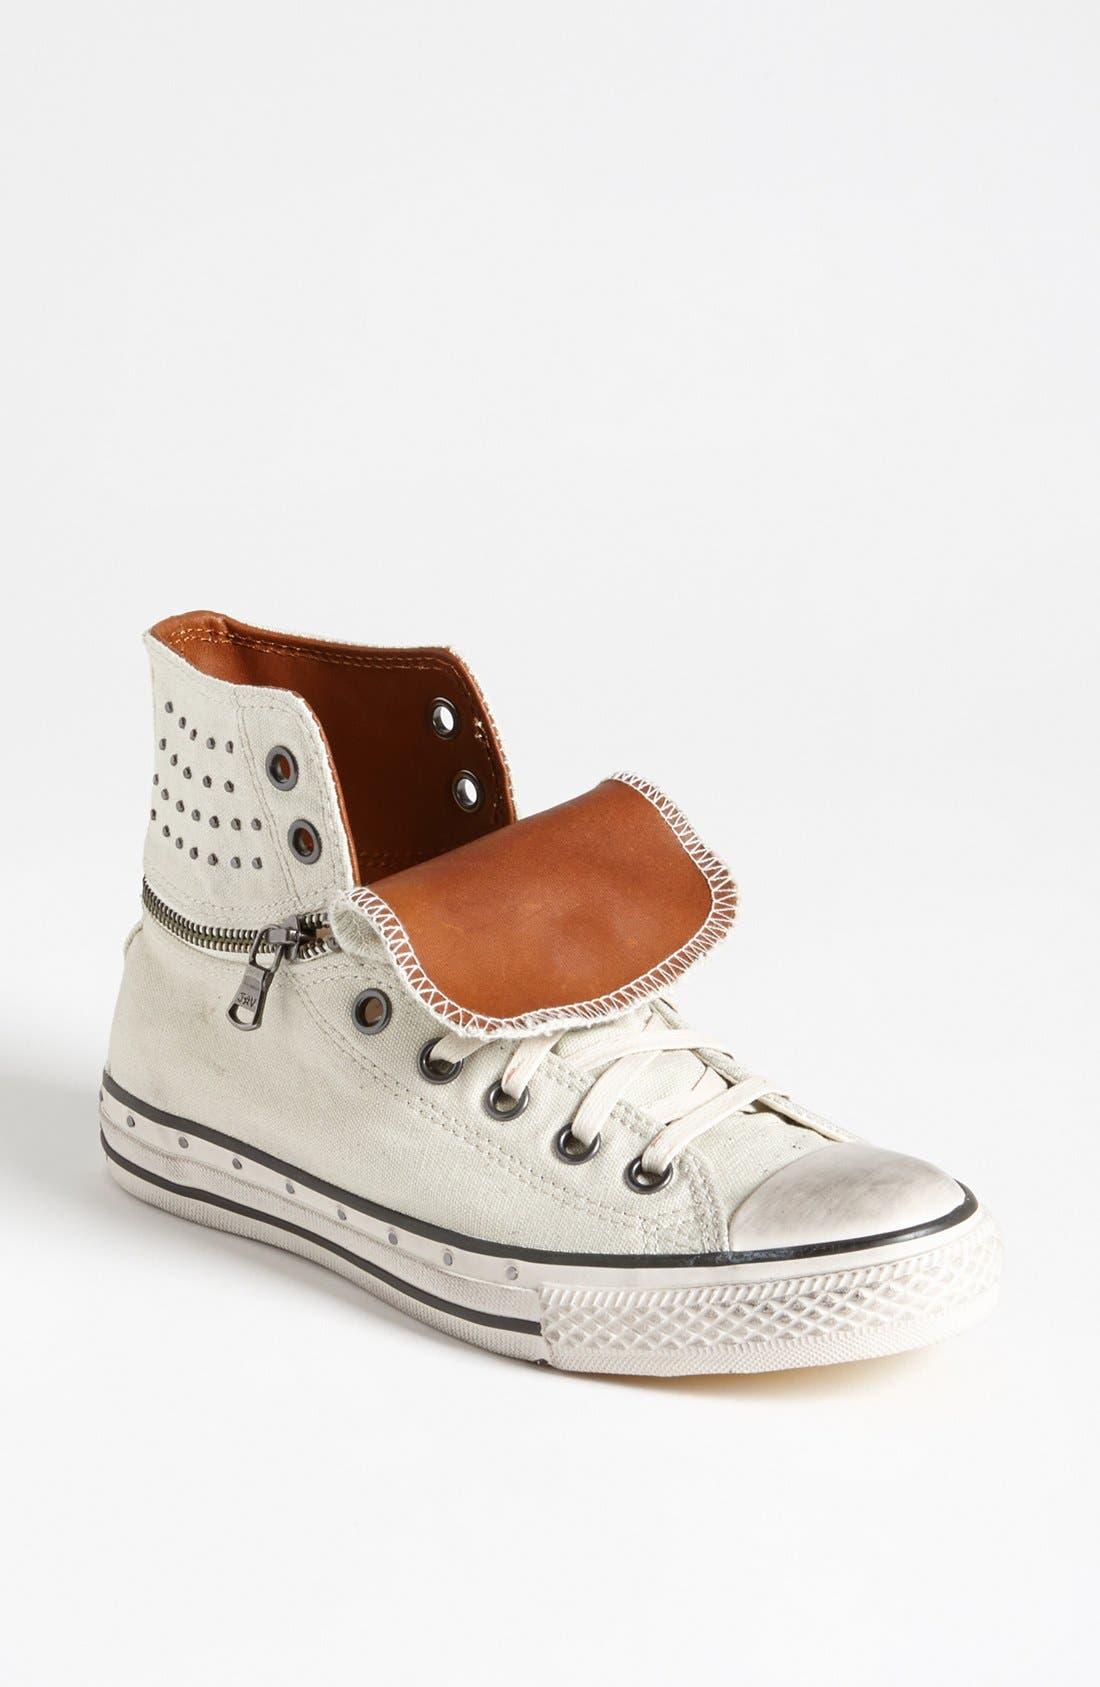 Main Image - Converse by John Varvatos Chuck Taylor® Convertible Sneaker (Women)